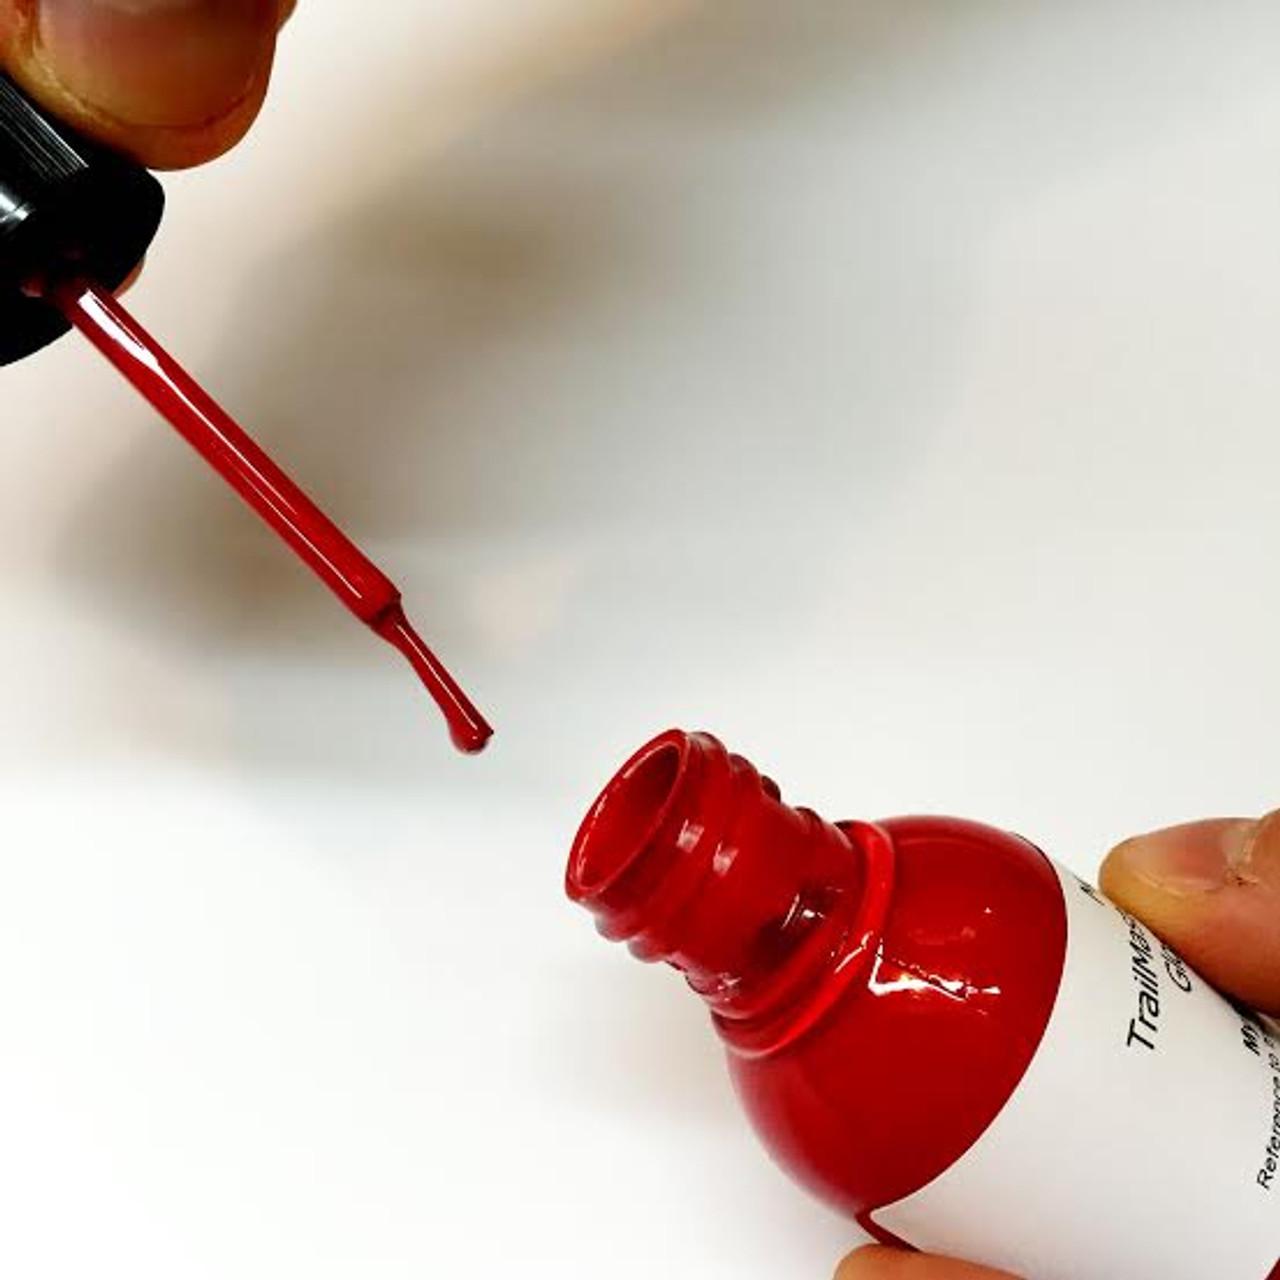 TrailMaster Go-Kart Touch Up Paint - 1 Oz. Bottle